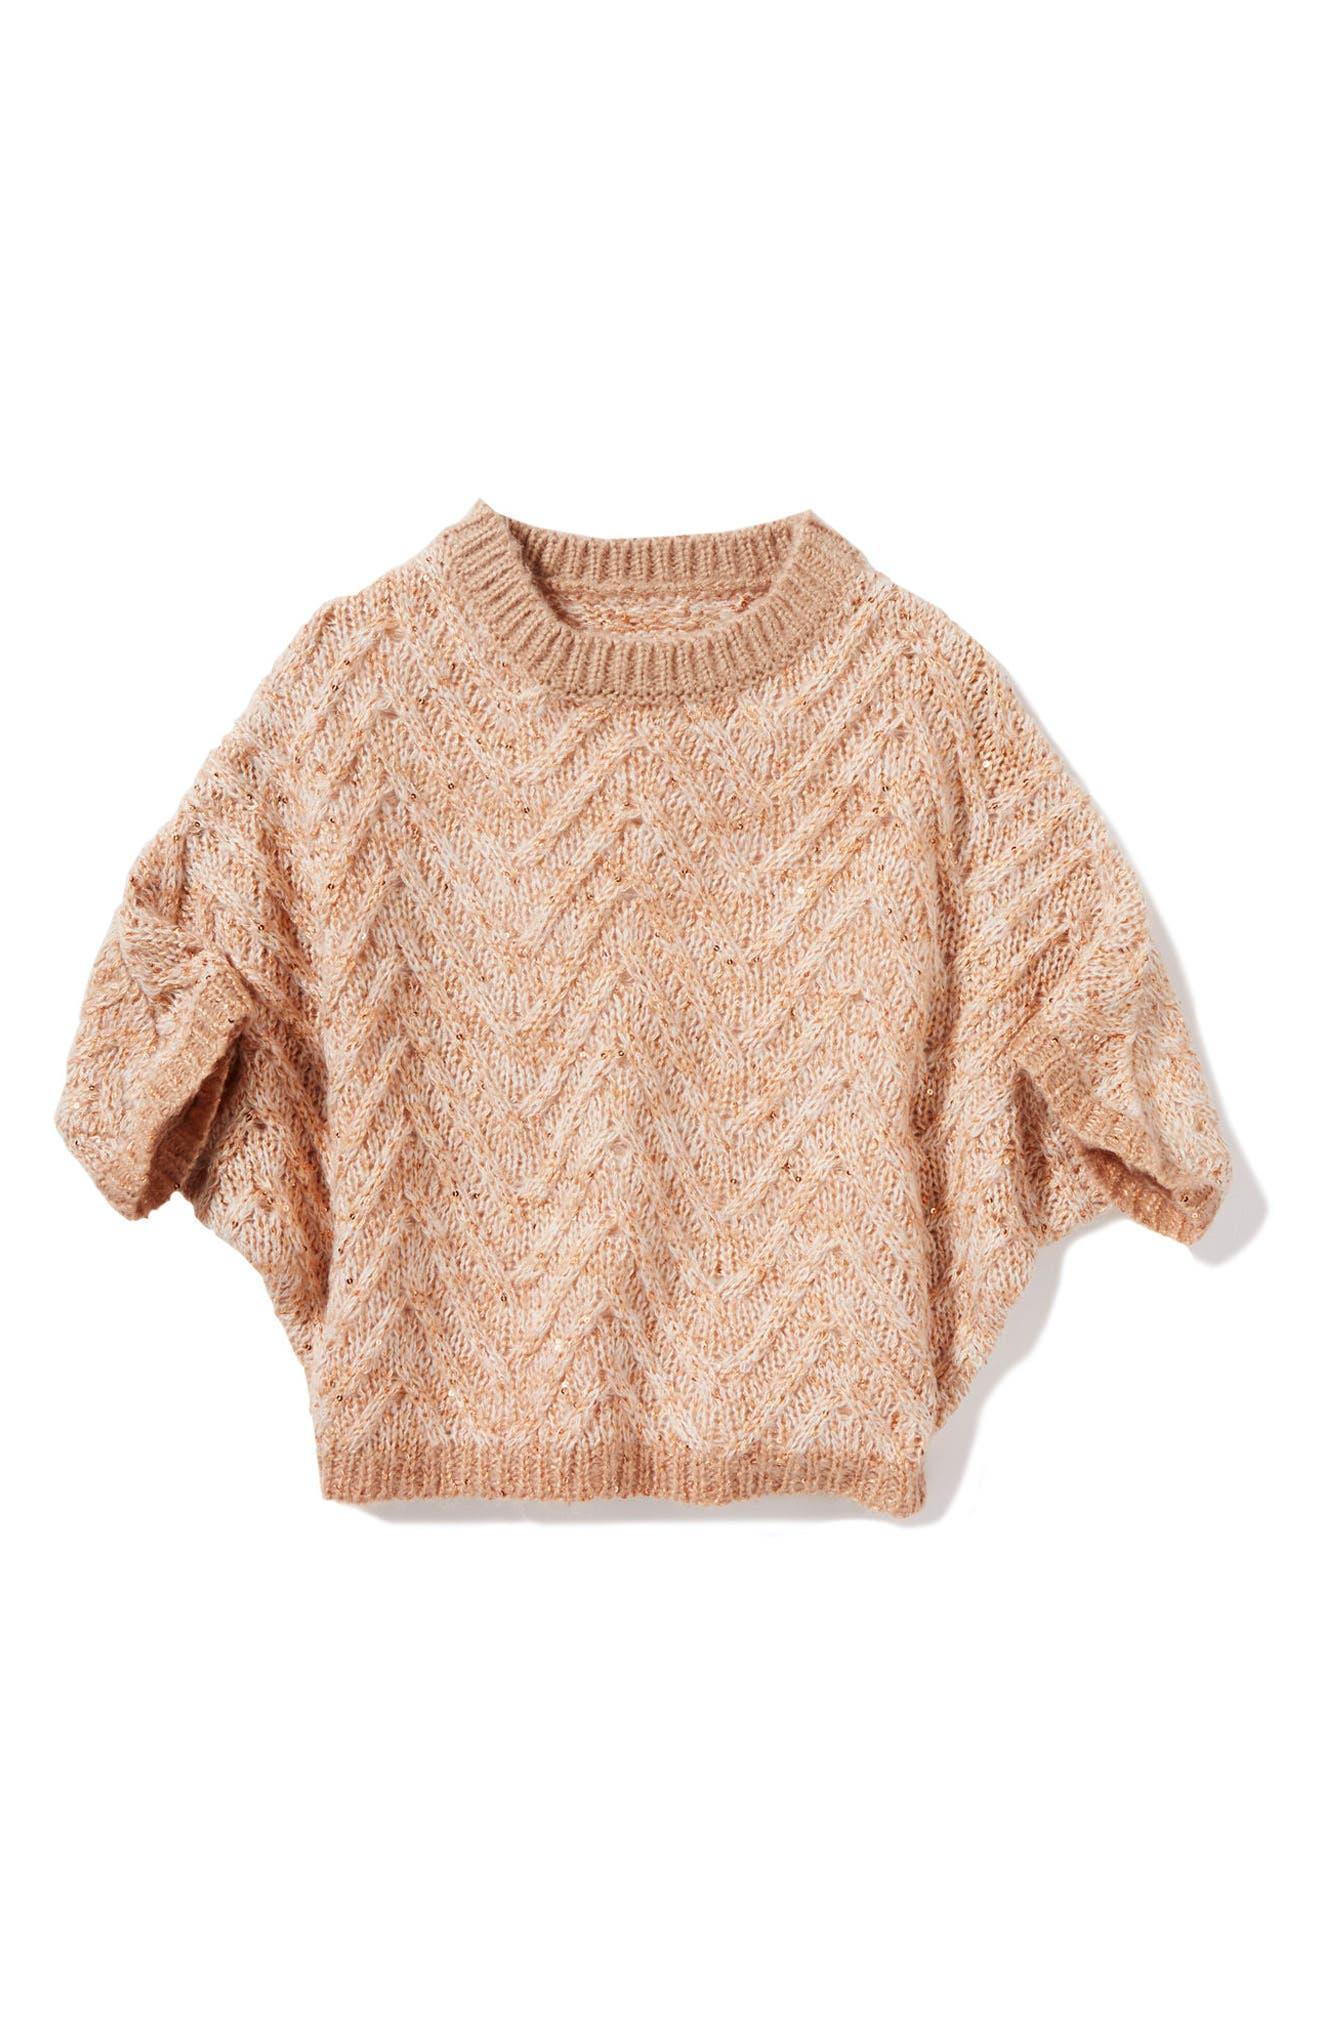 Main Image - Peek Olivia Chevron Stripe Sweater (Toddler Girls, Little Girls & Big Girls)